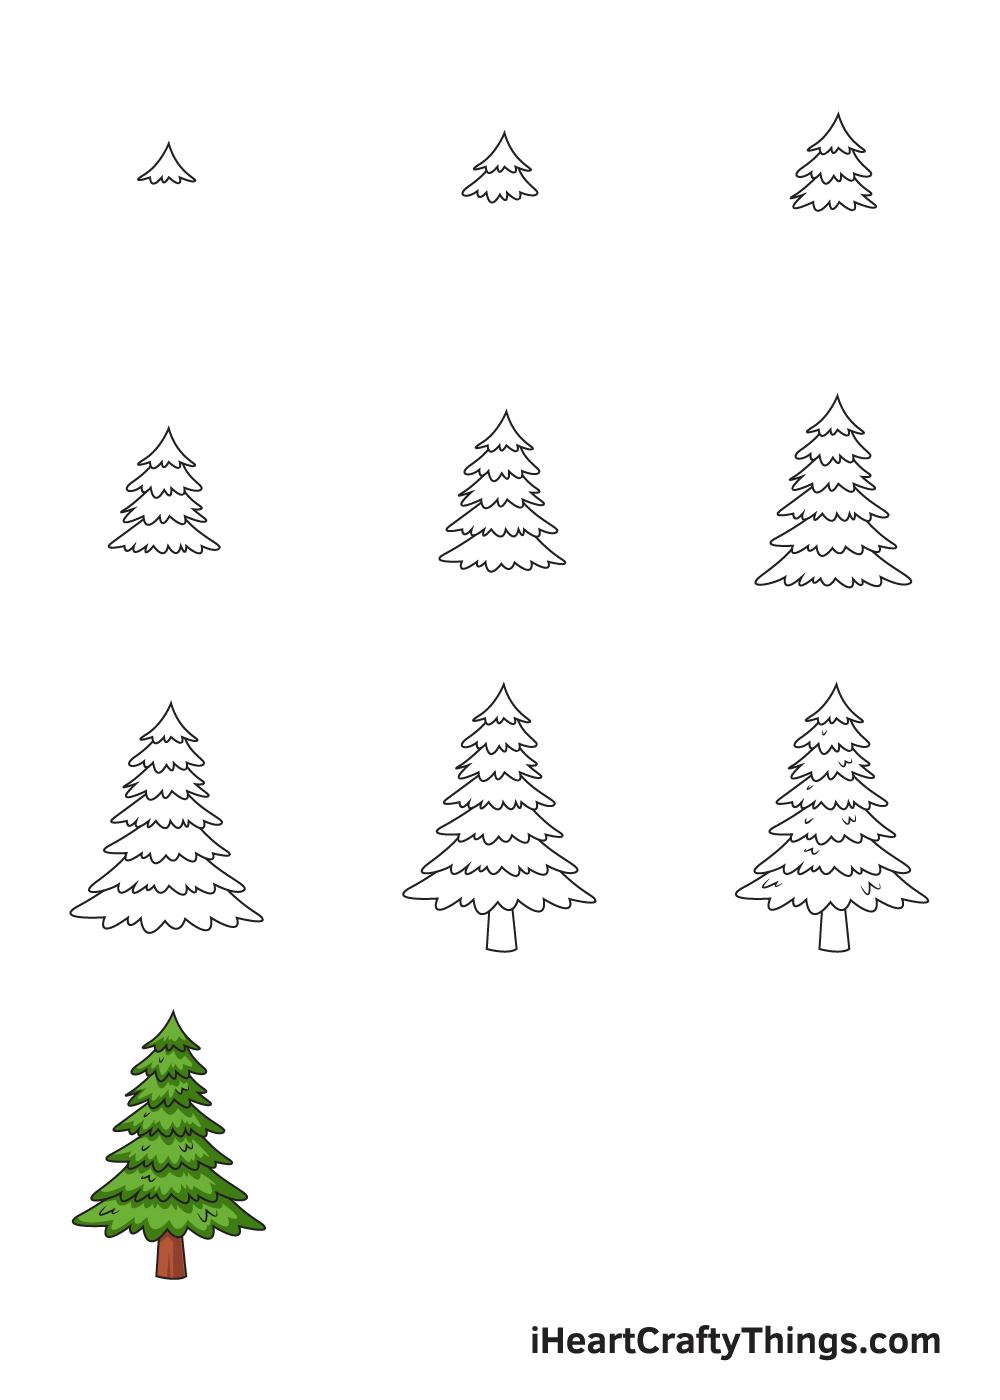 drawing pine tree in 9 steps